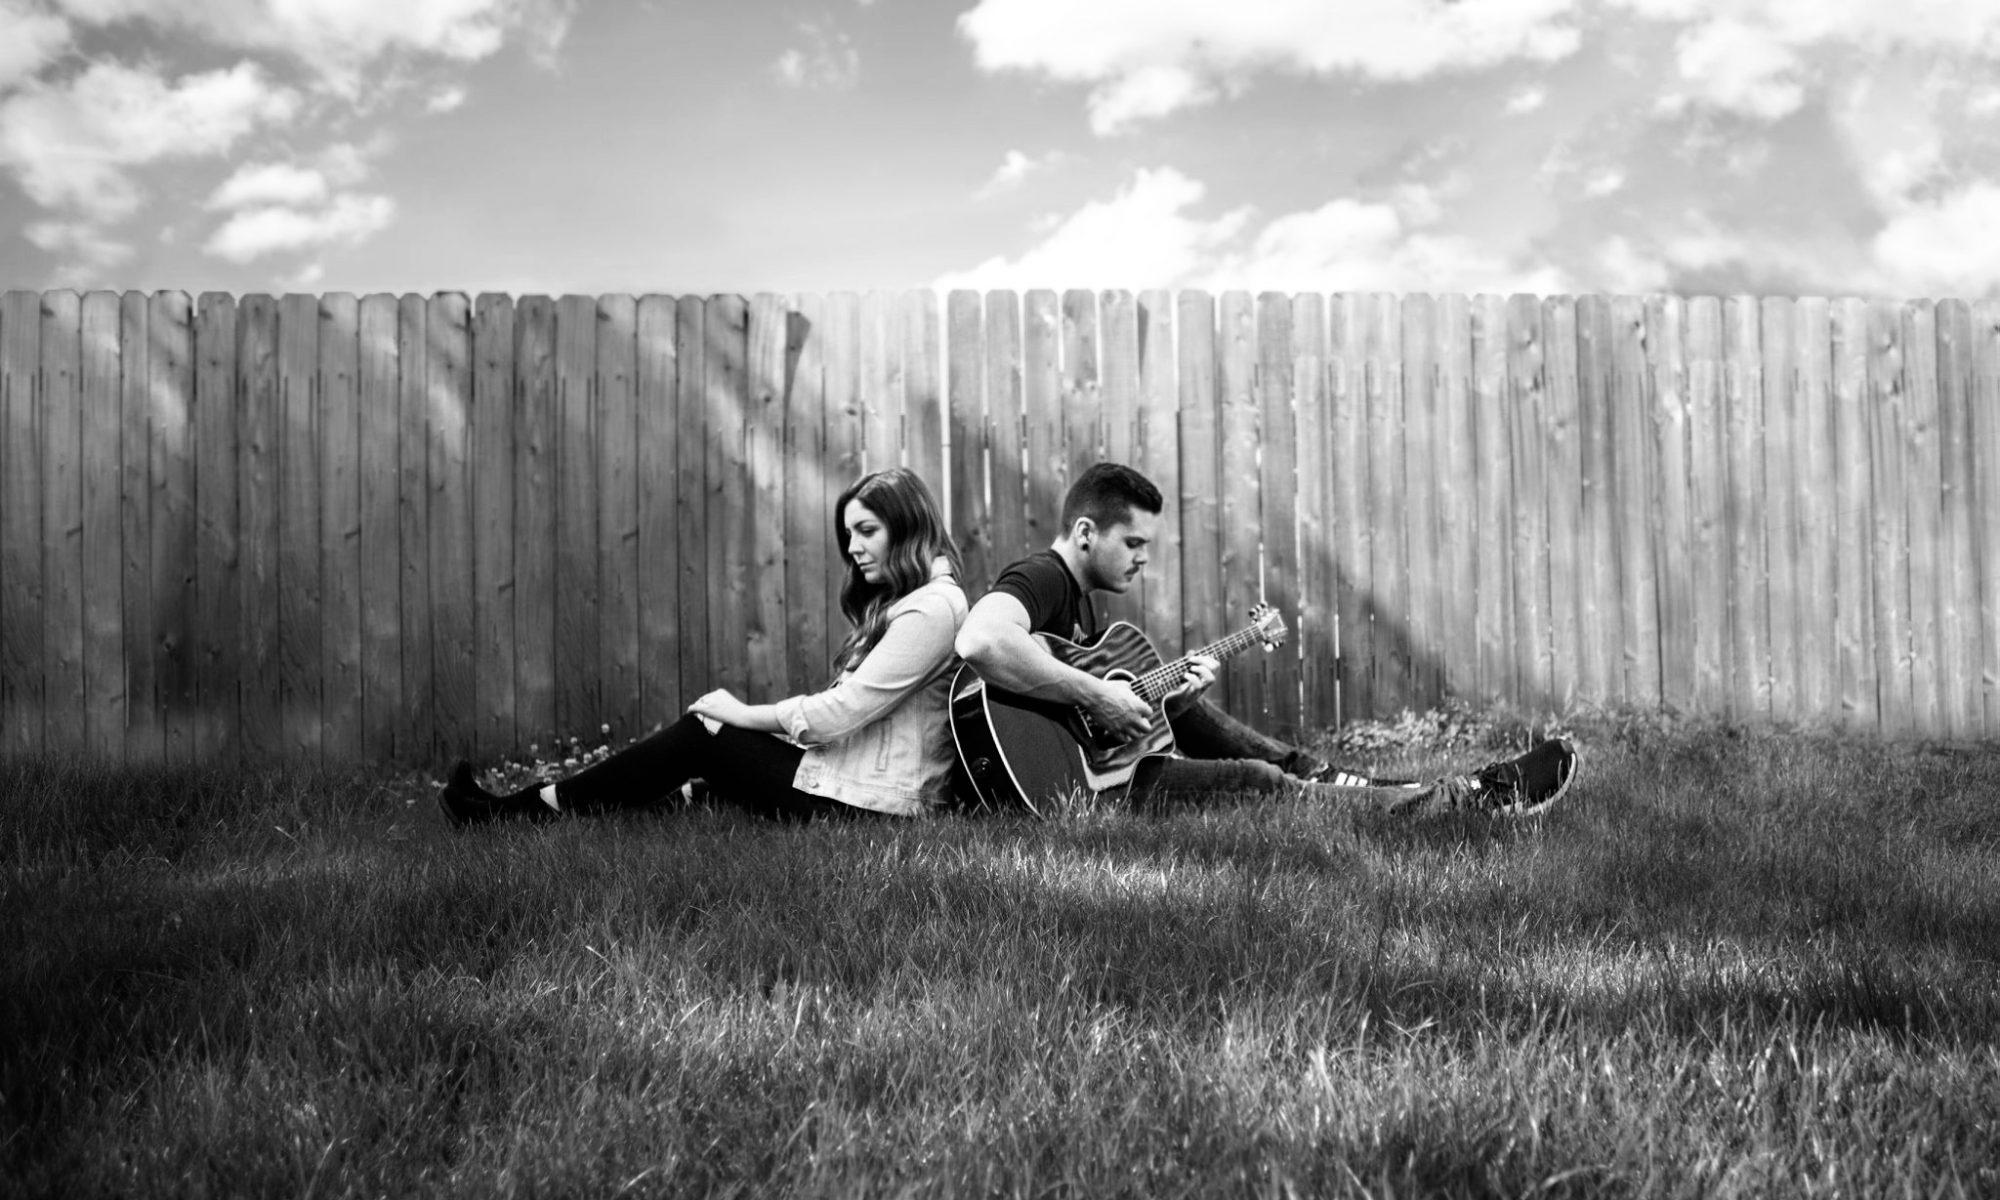 Luke and Amy